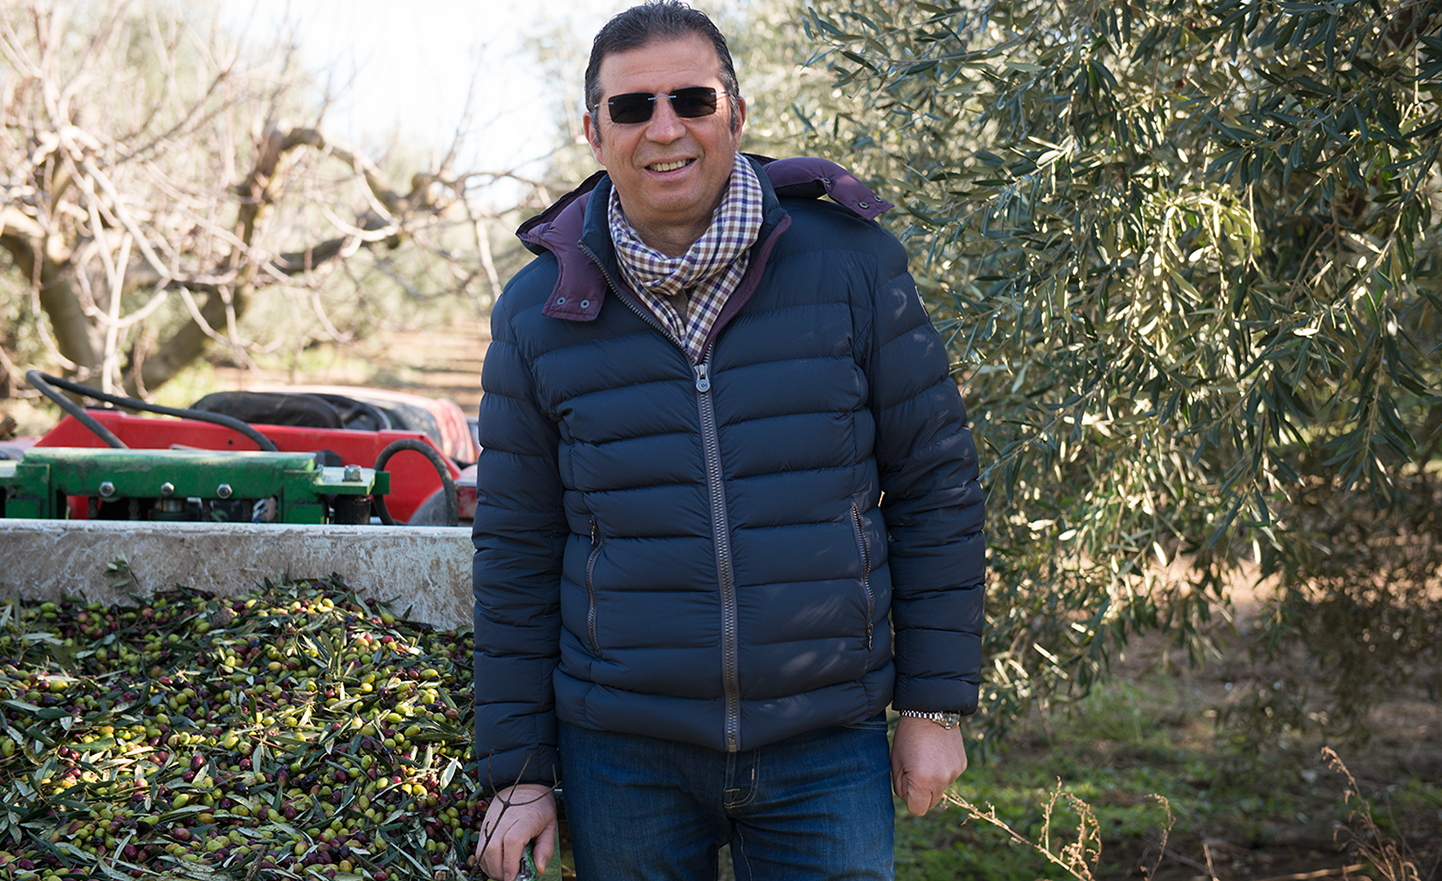 Amore per le olive